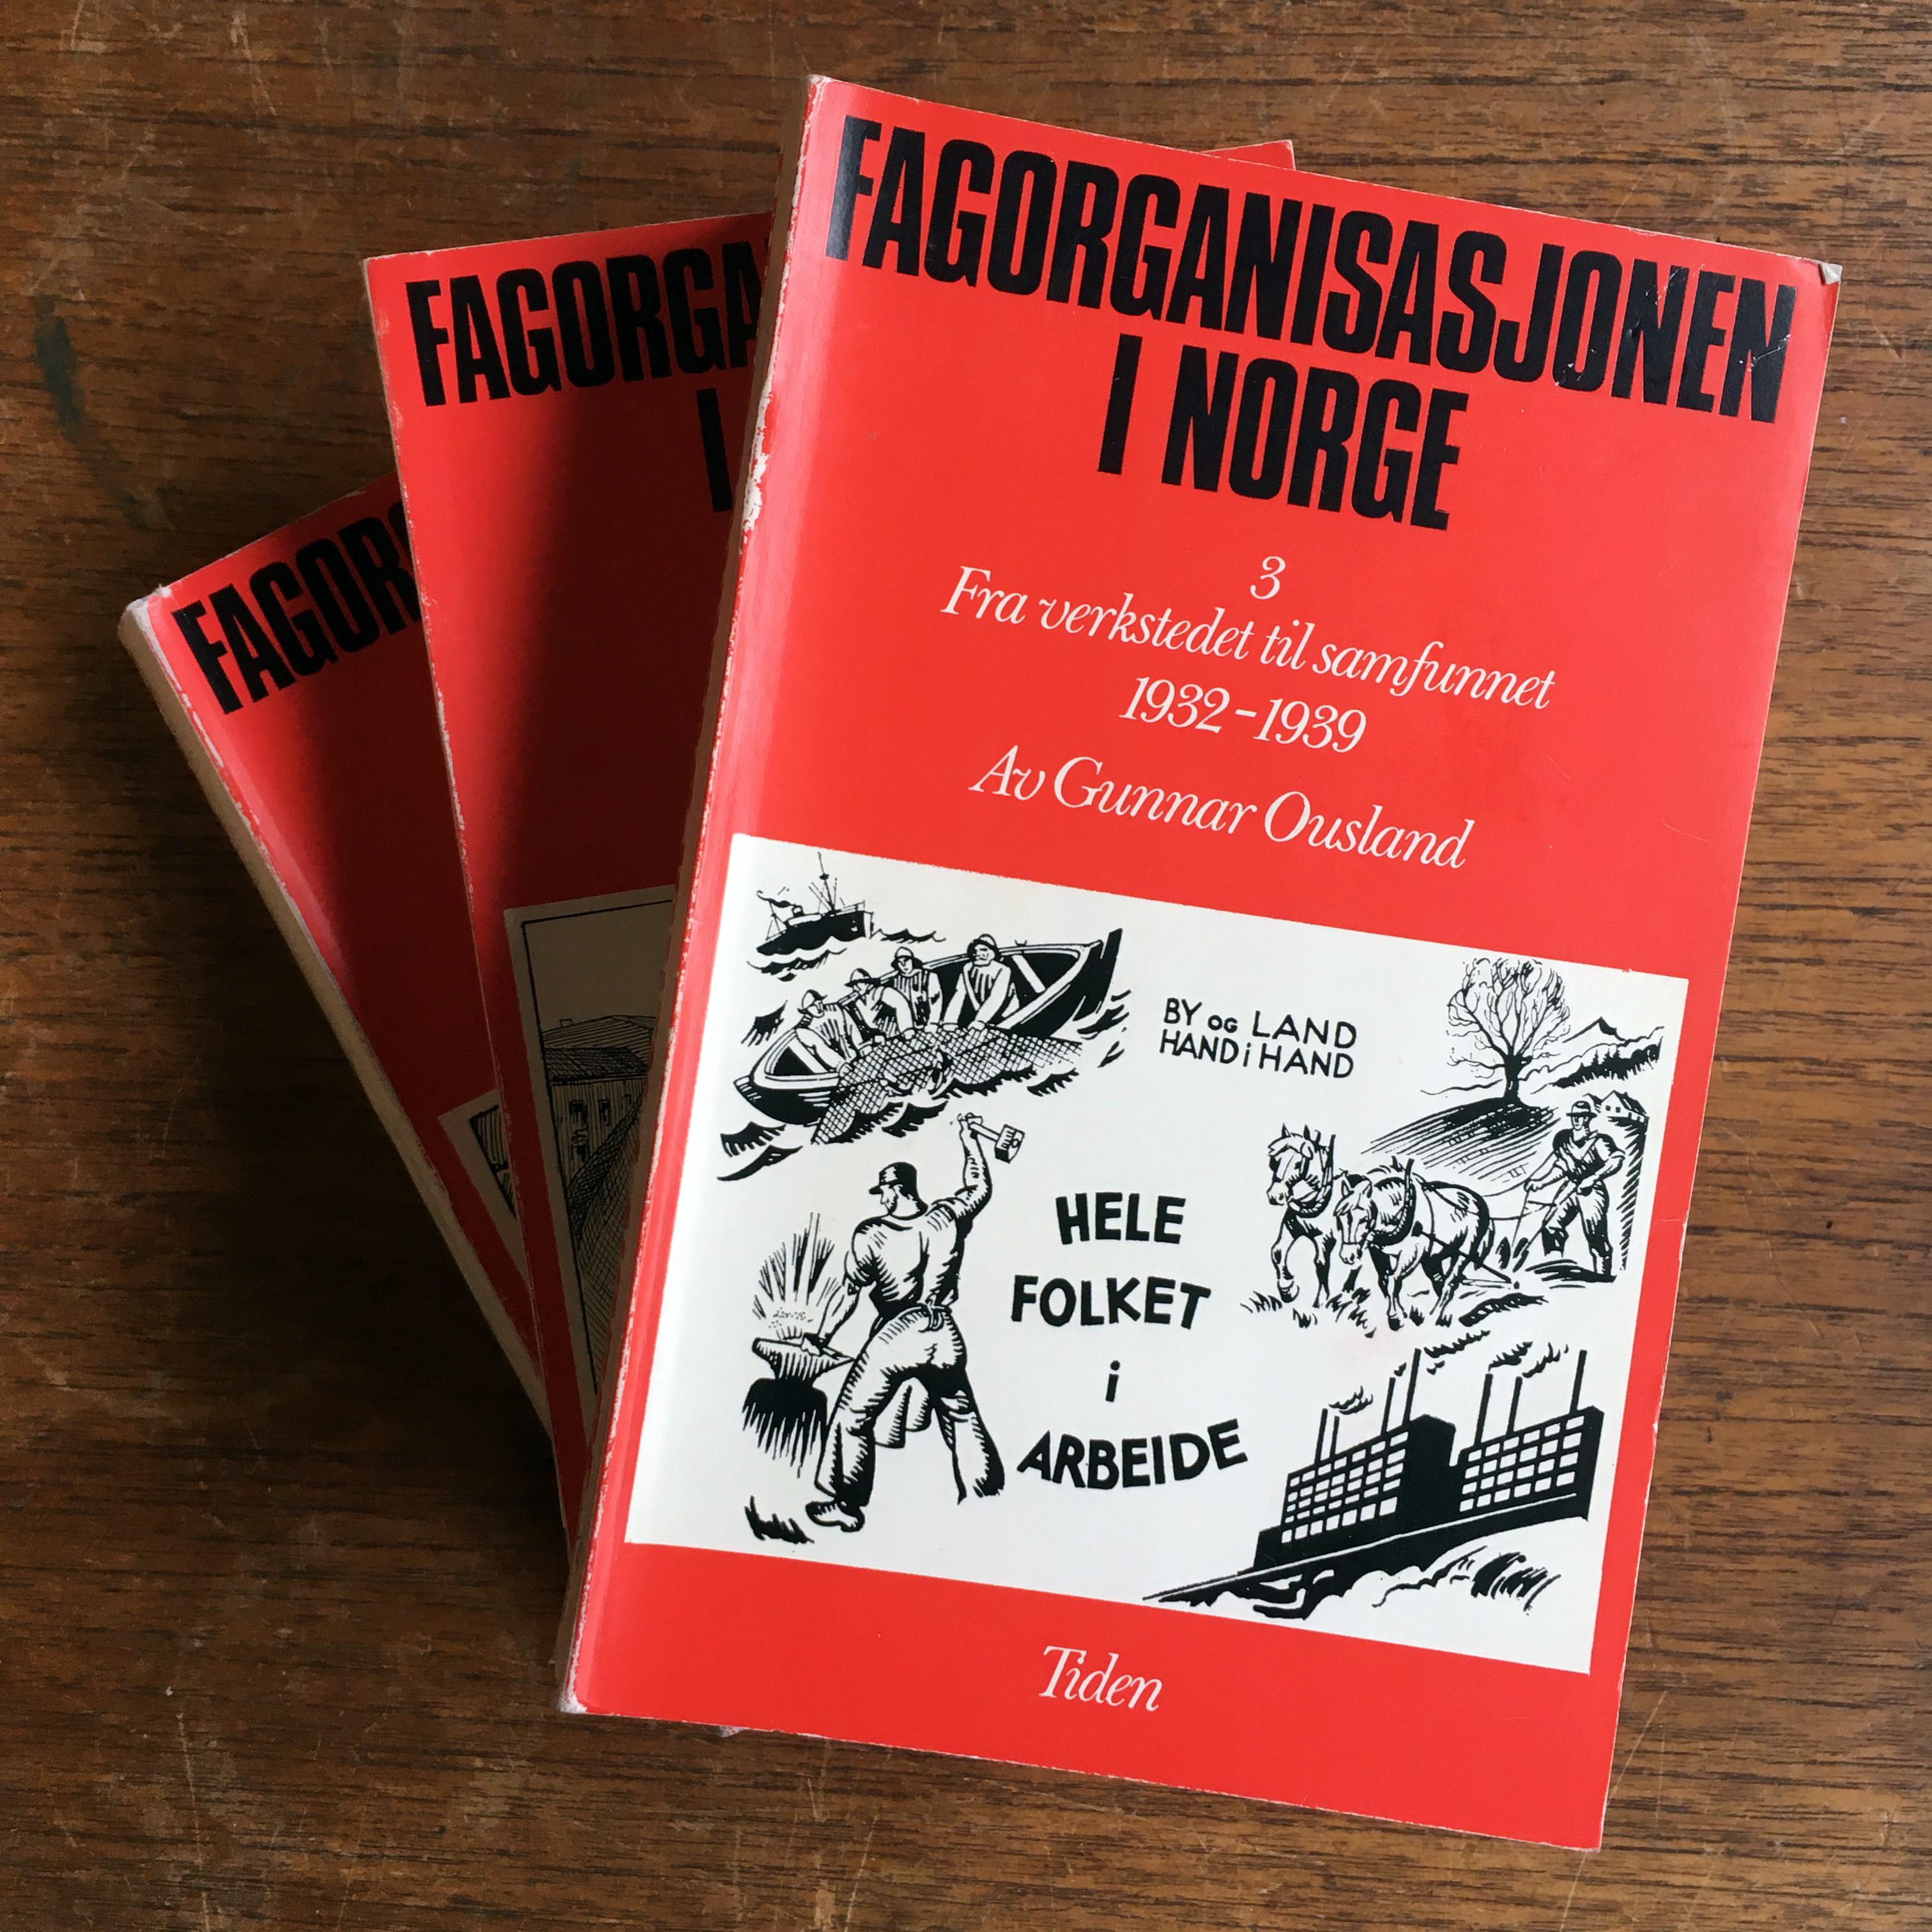 Gunnar Ousland: Fagorganisasjonen i Norge - Bind I-III